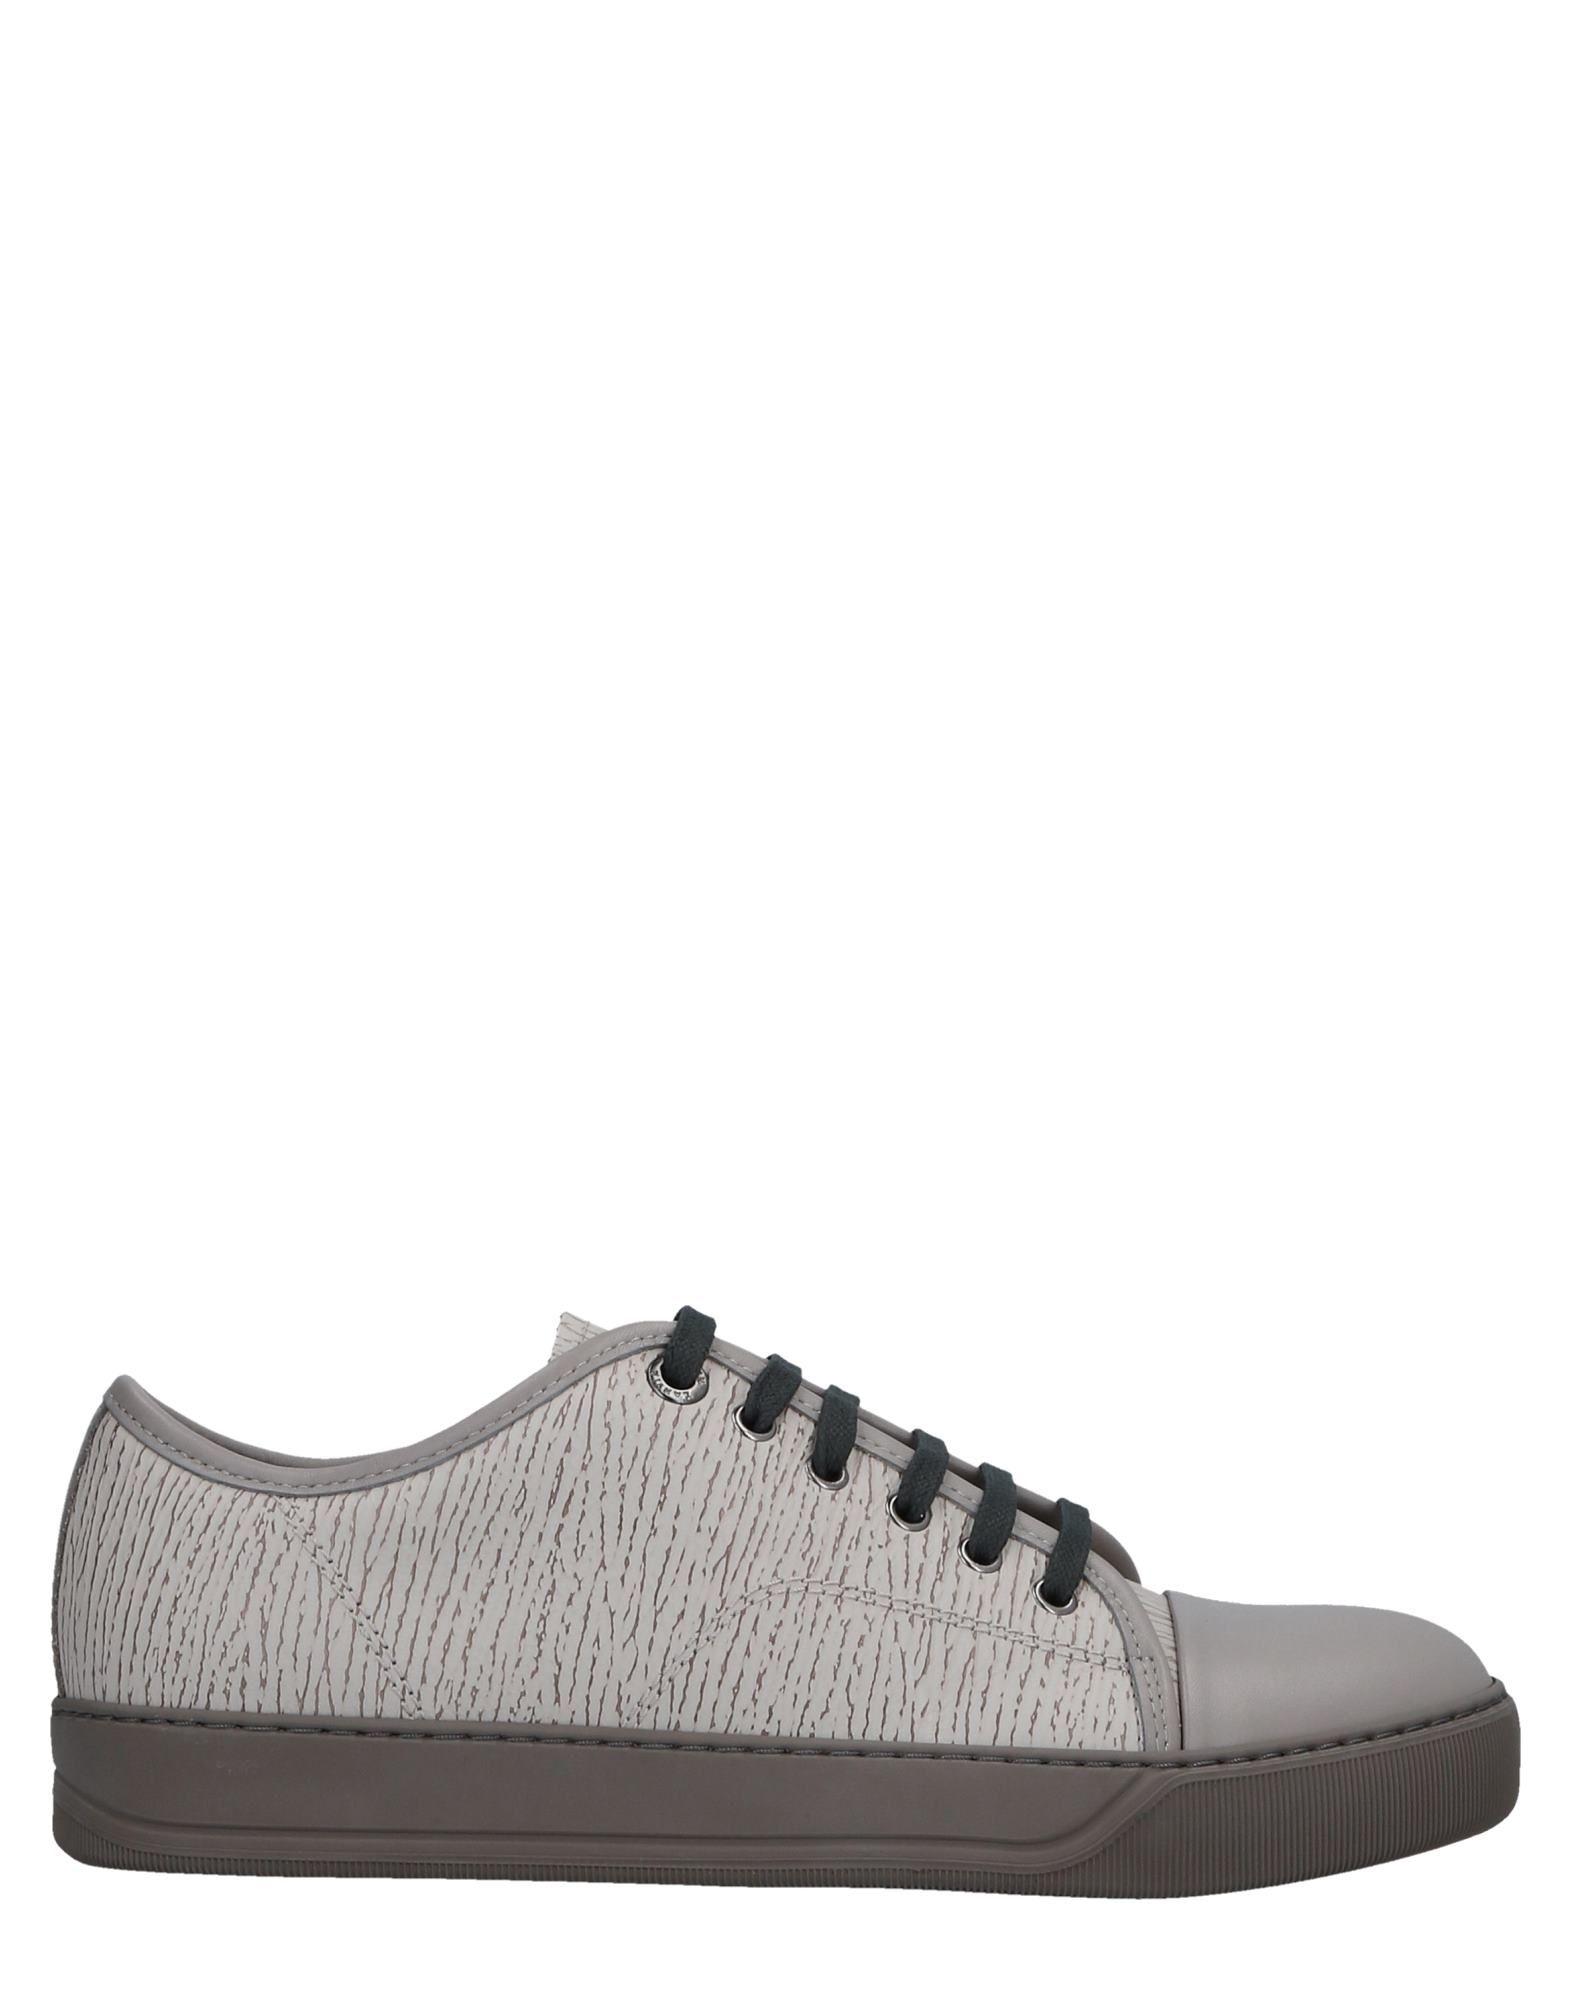 Lanvin Sneakers Herren  11514100PW Gute Qualität beliebte Schuhe